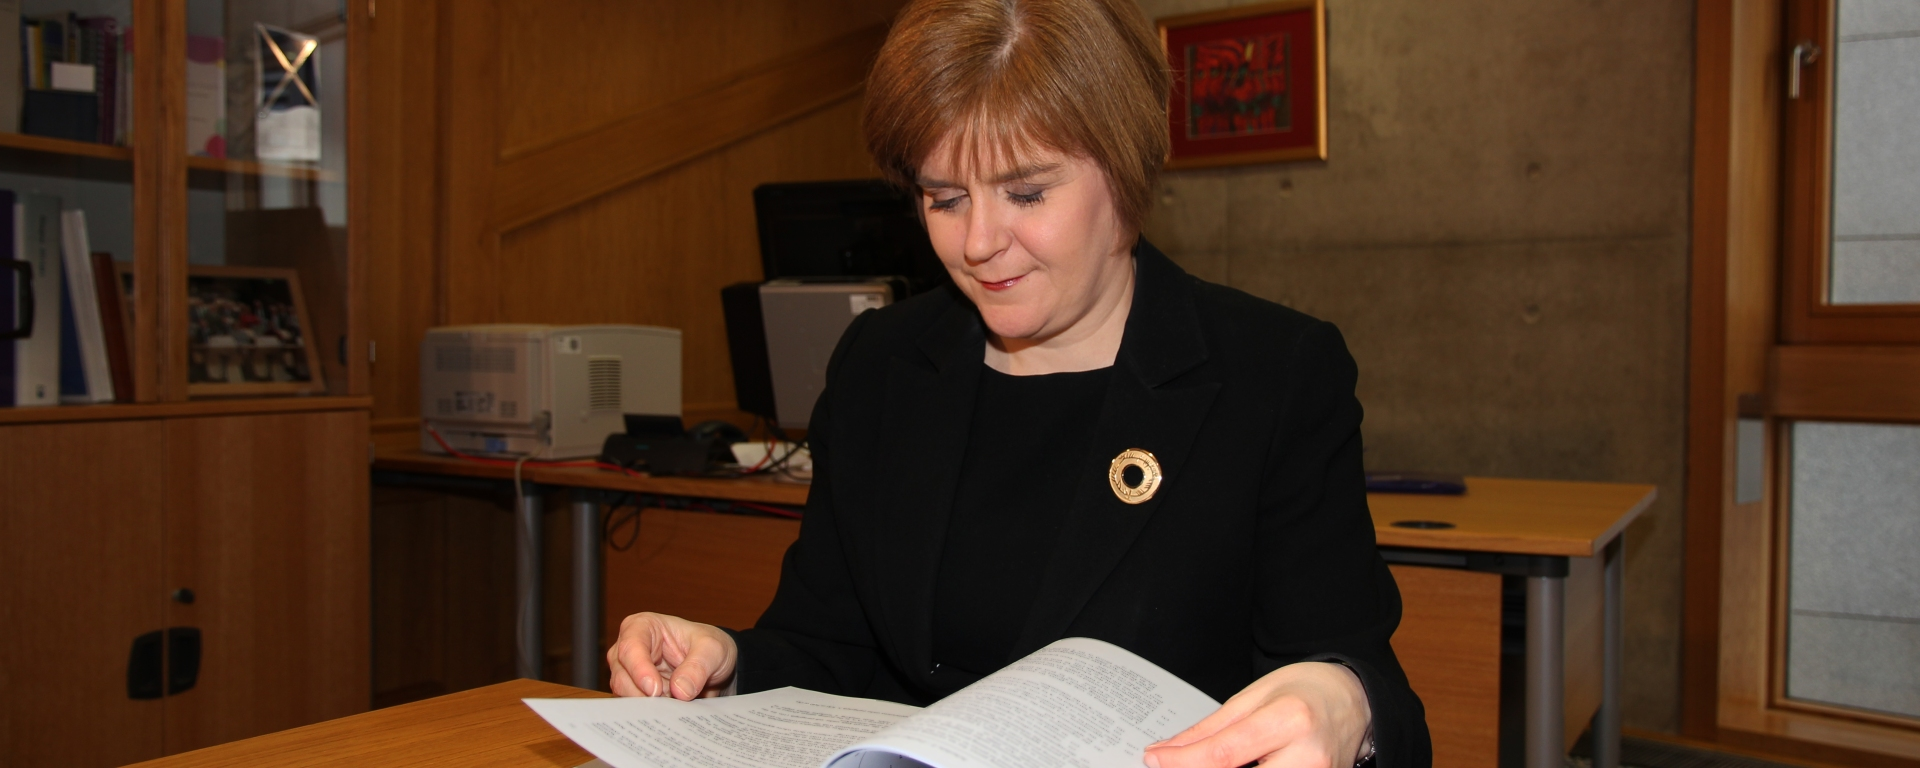 Il Primo Ministro scozzese, Nicola Sturgeon